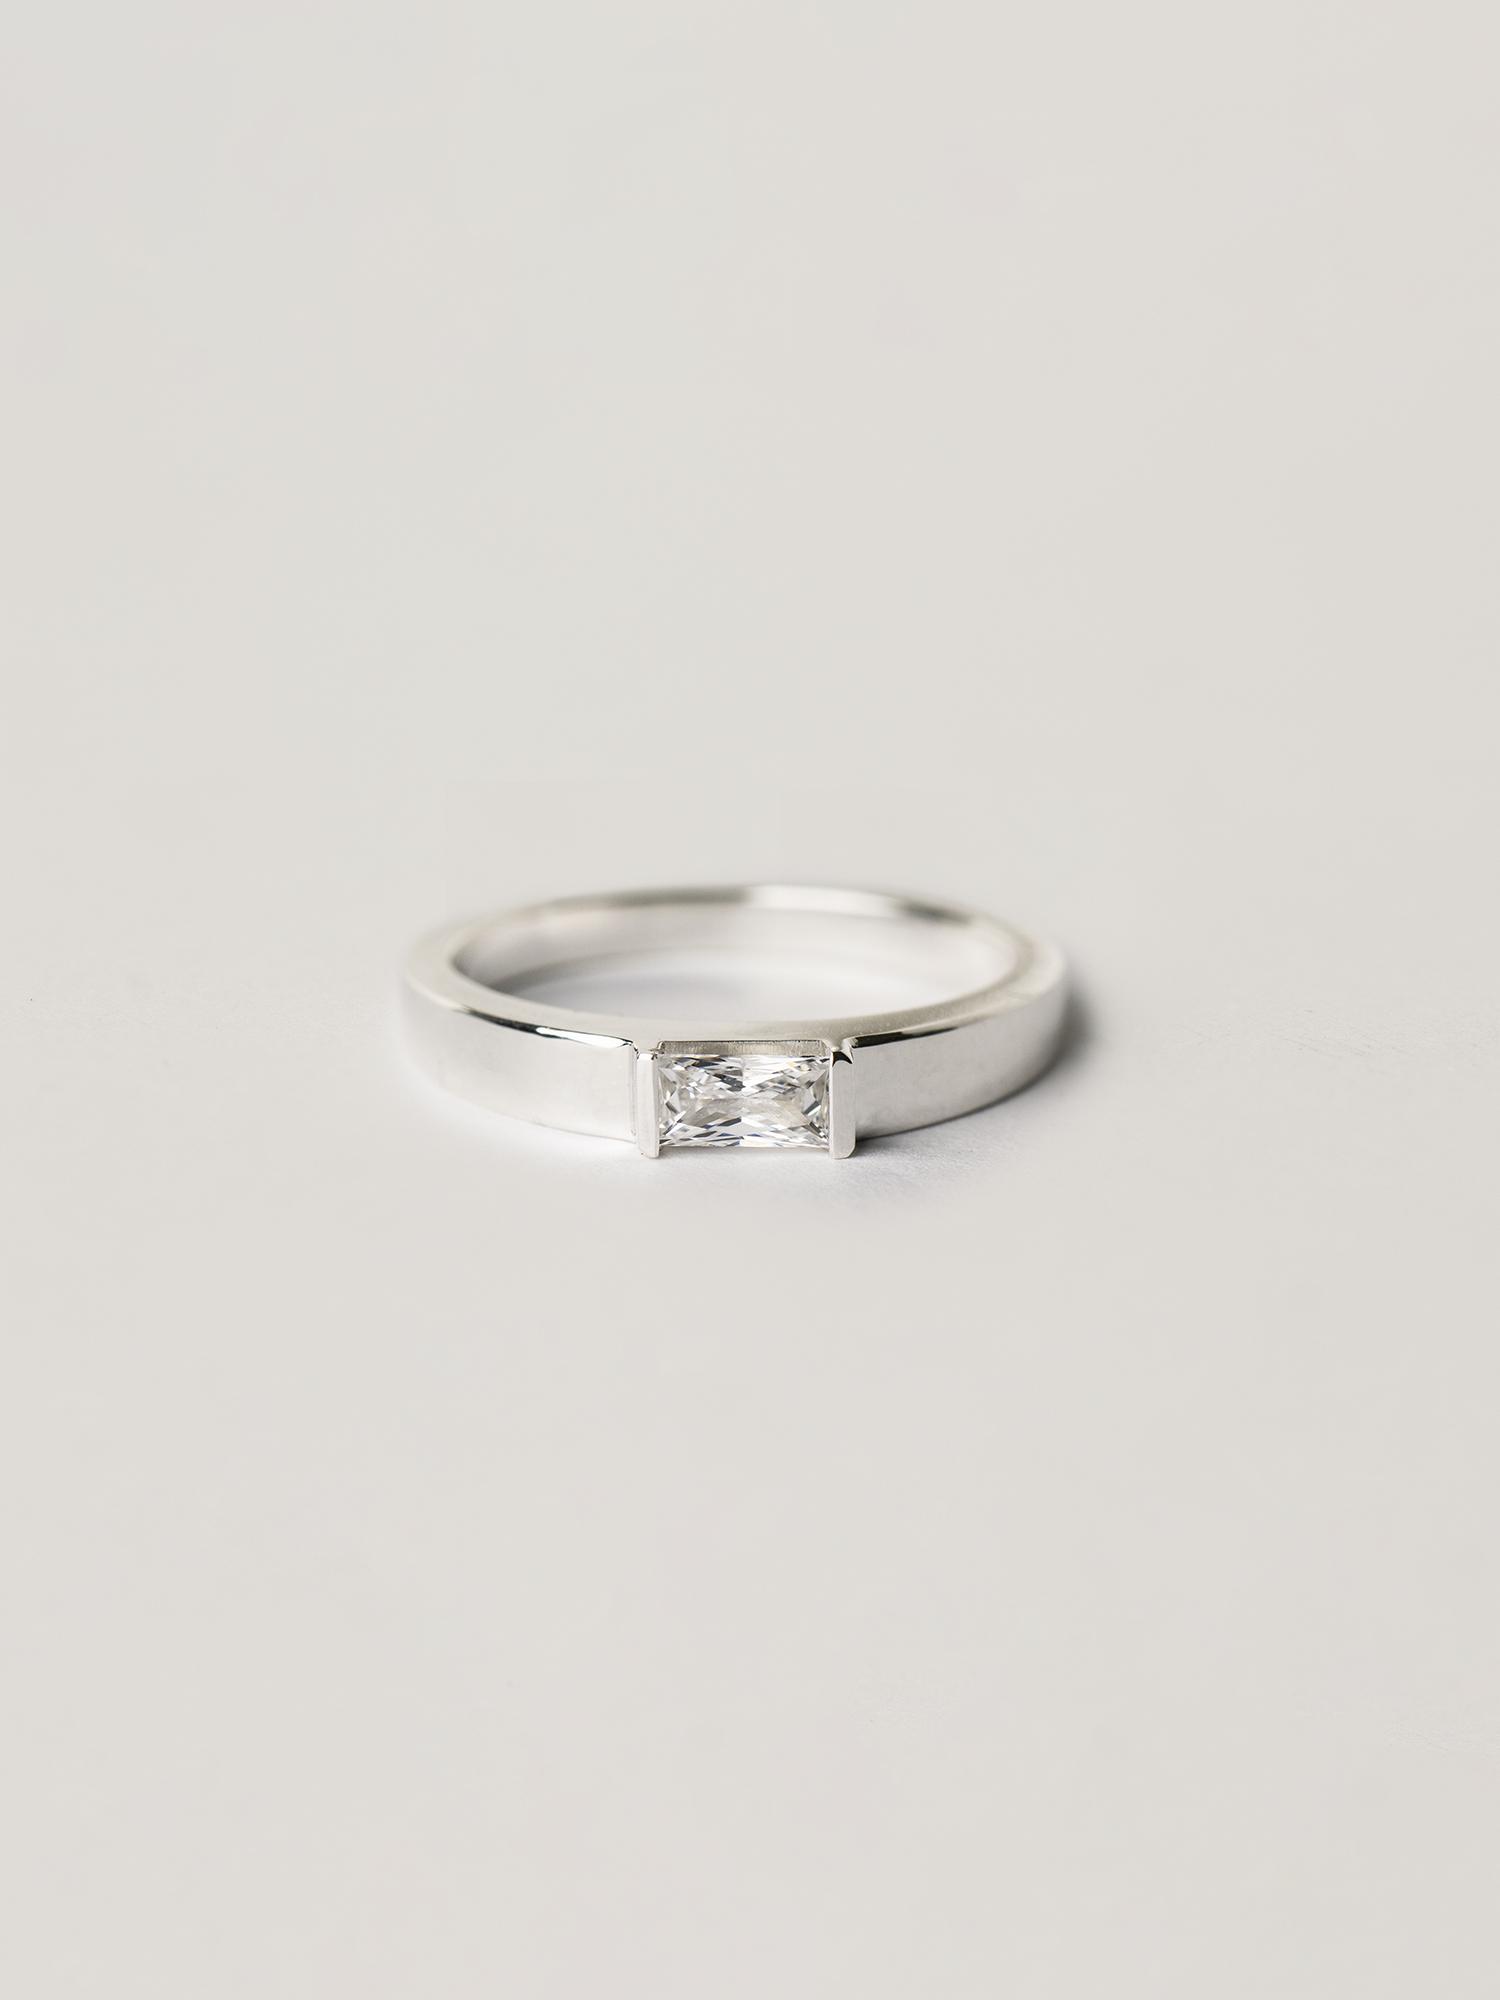 Christina-Pauls-Minima-Prinzess-Diamant-Silber2.jpg